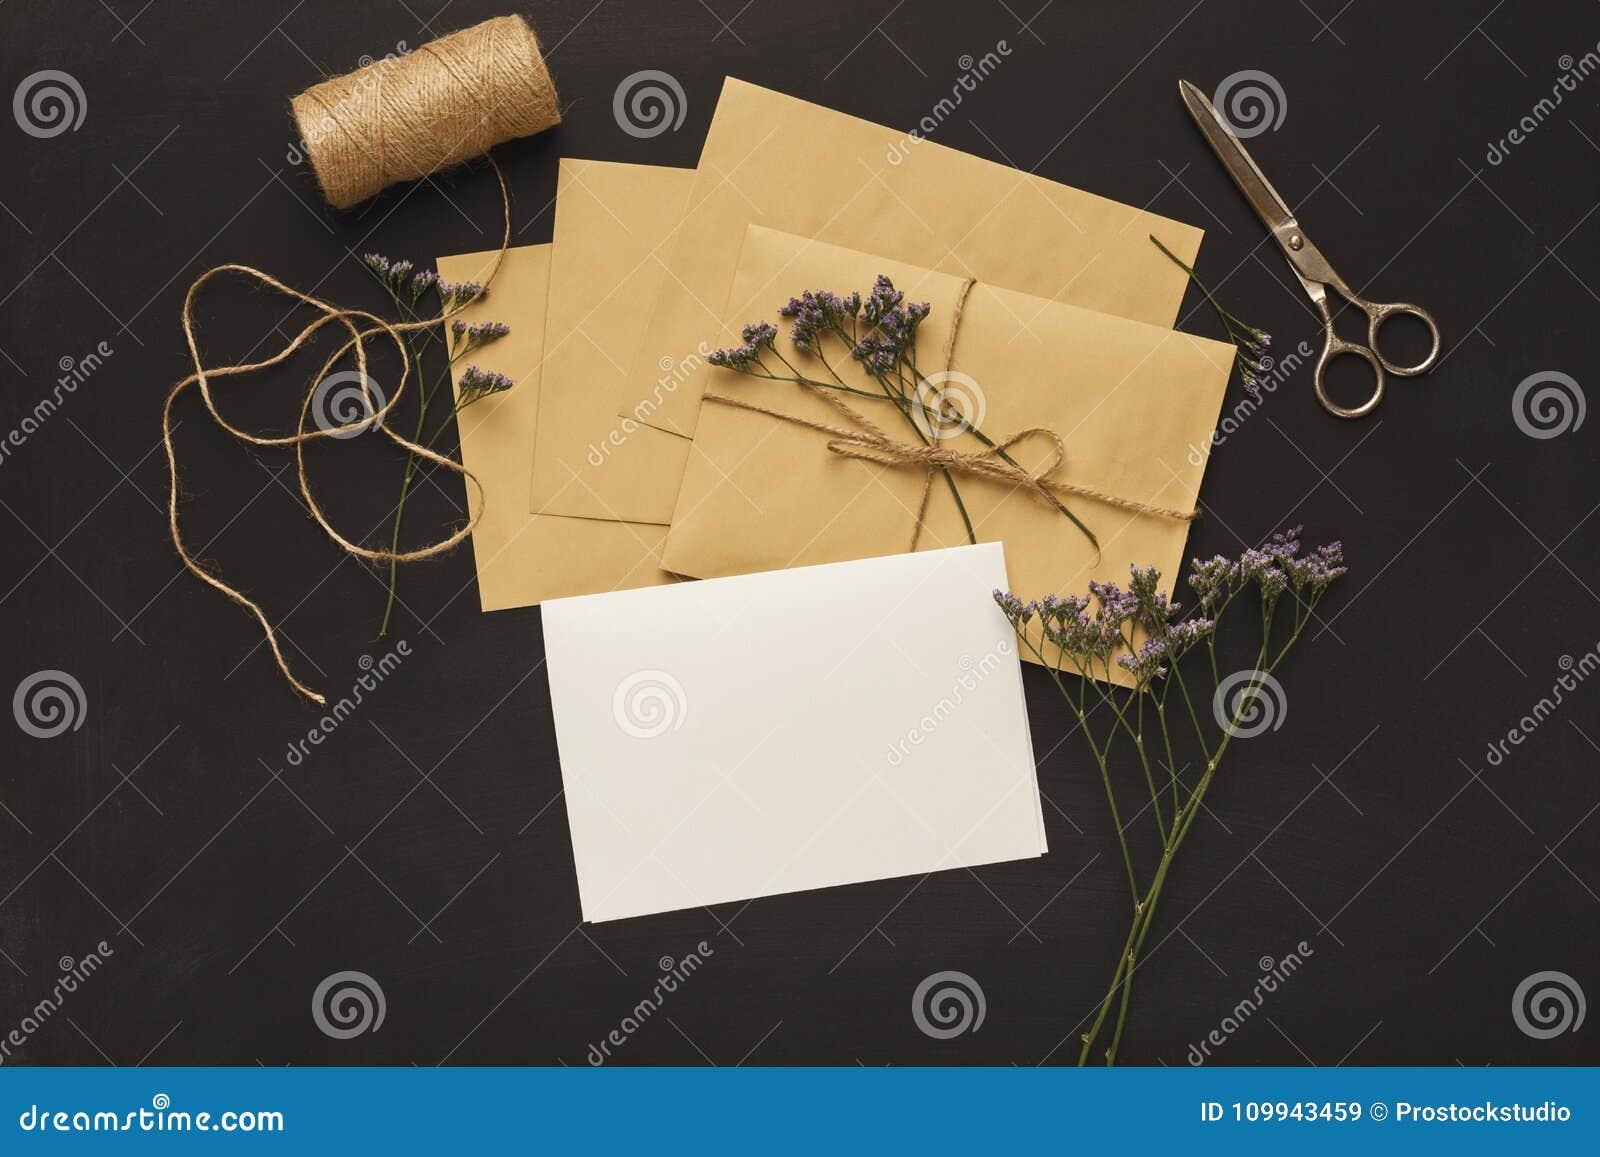 Wedding Invitation Cards And Envelopes On Black Background